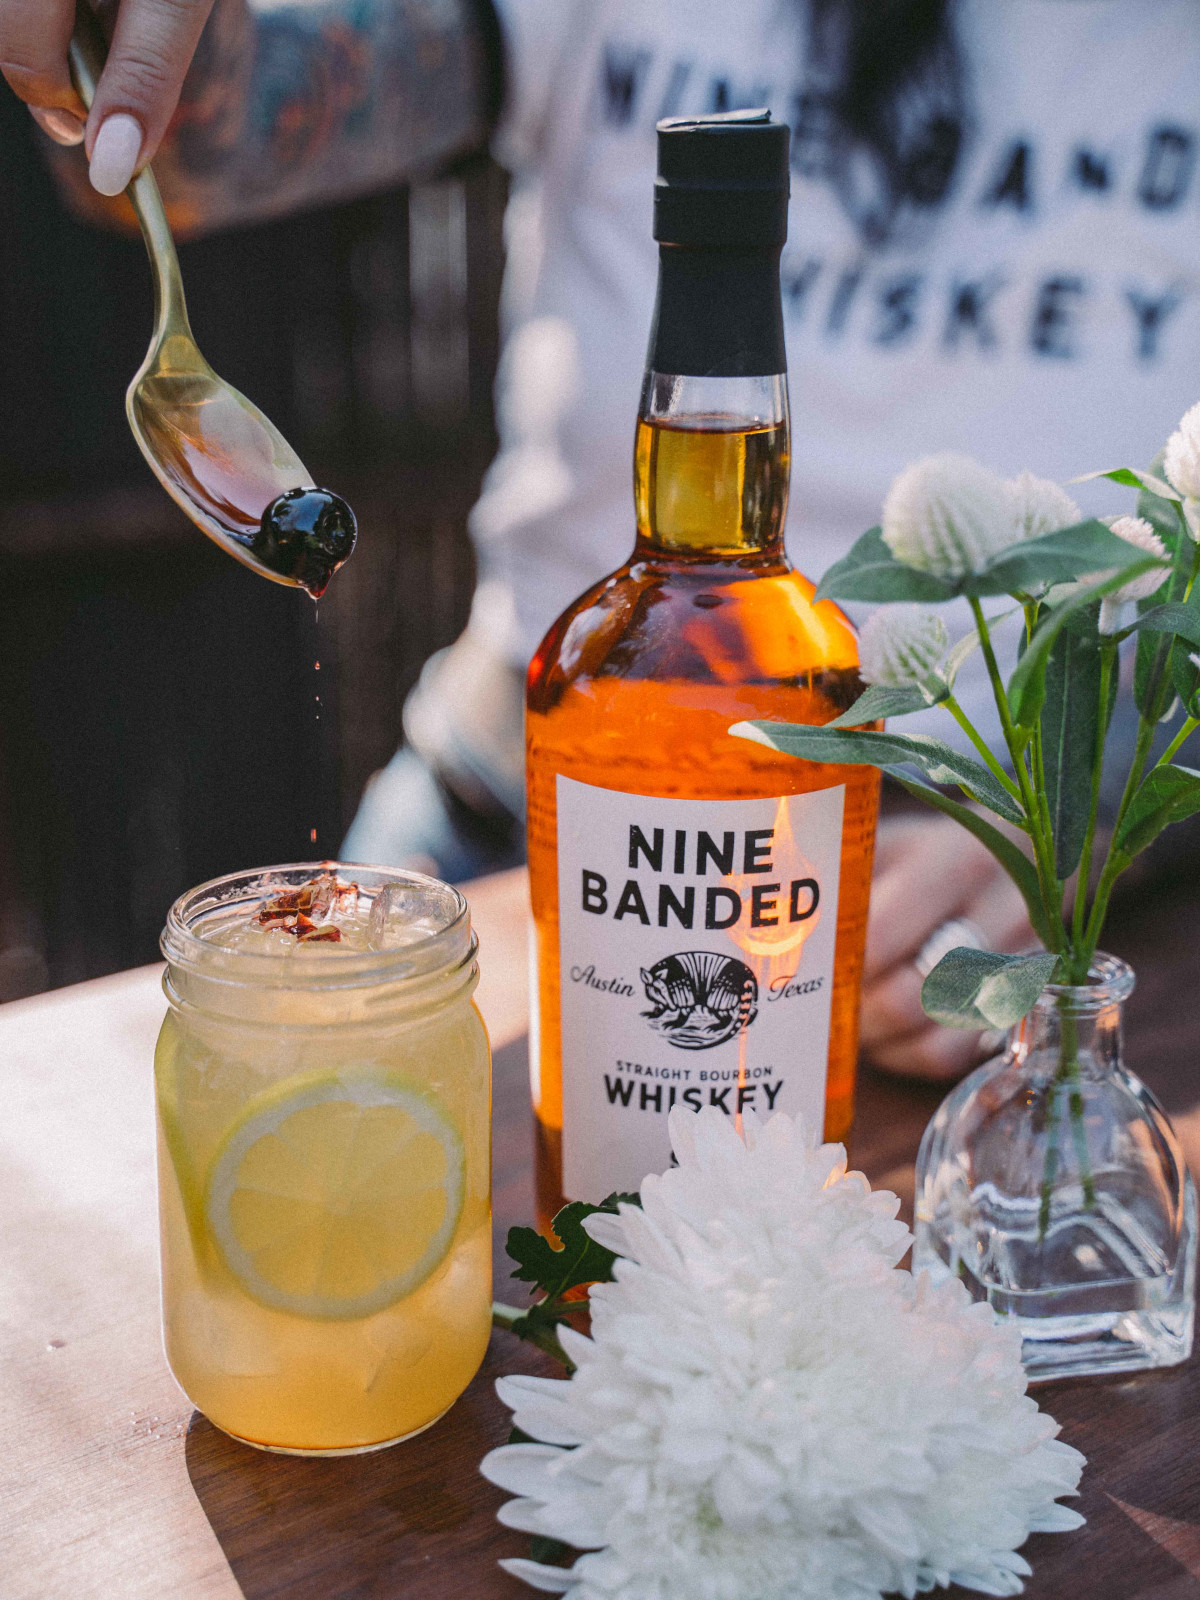 Nine Banded Whiskey cocktail